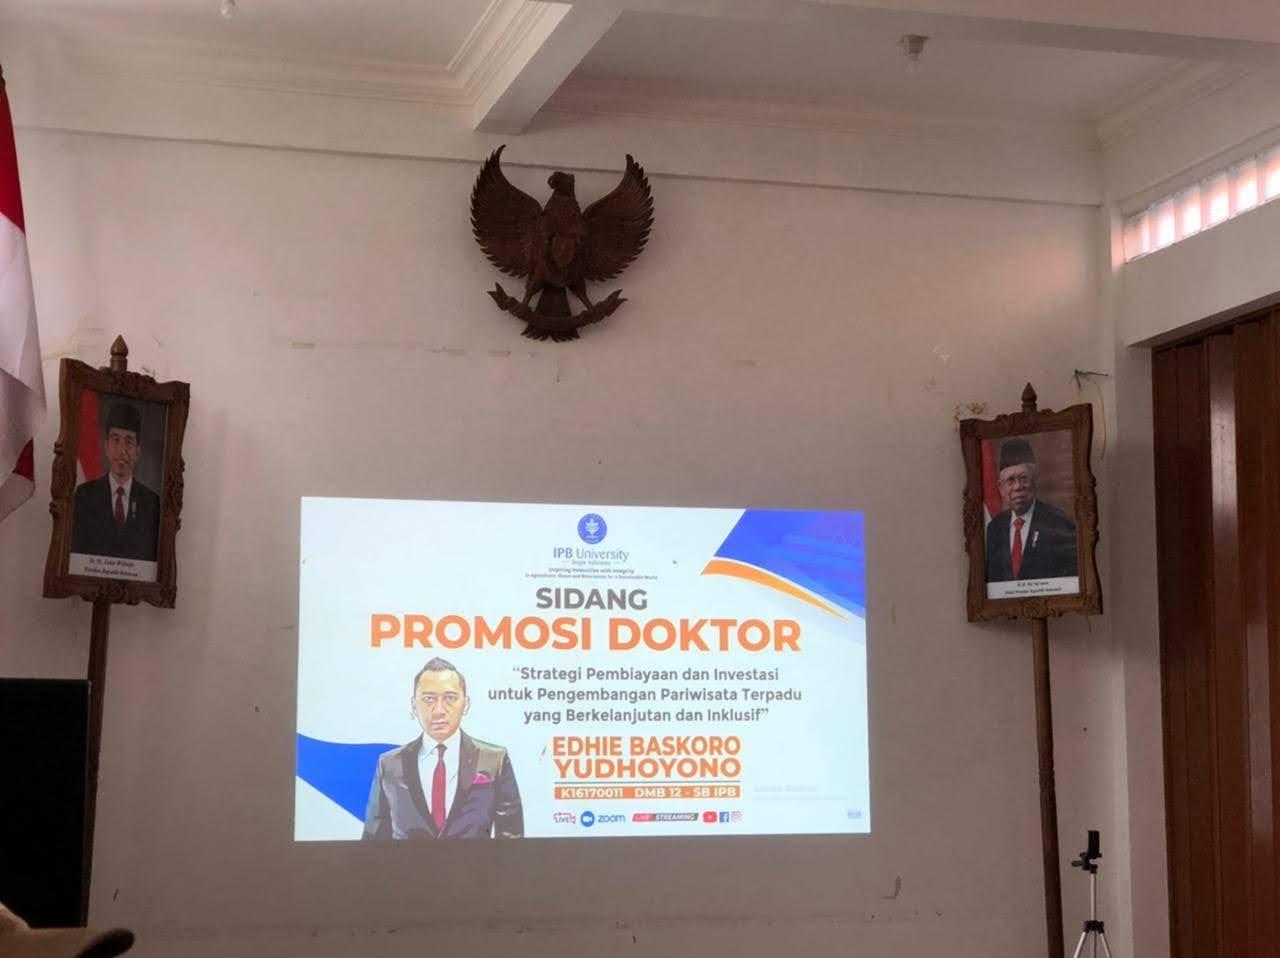 Selamat dan Semoga Sukses EBY Menjalani Sidang Promosi Doktor di Institut Pertanian Bogor Secara Daring